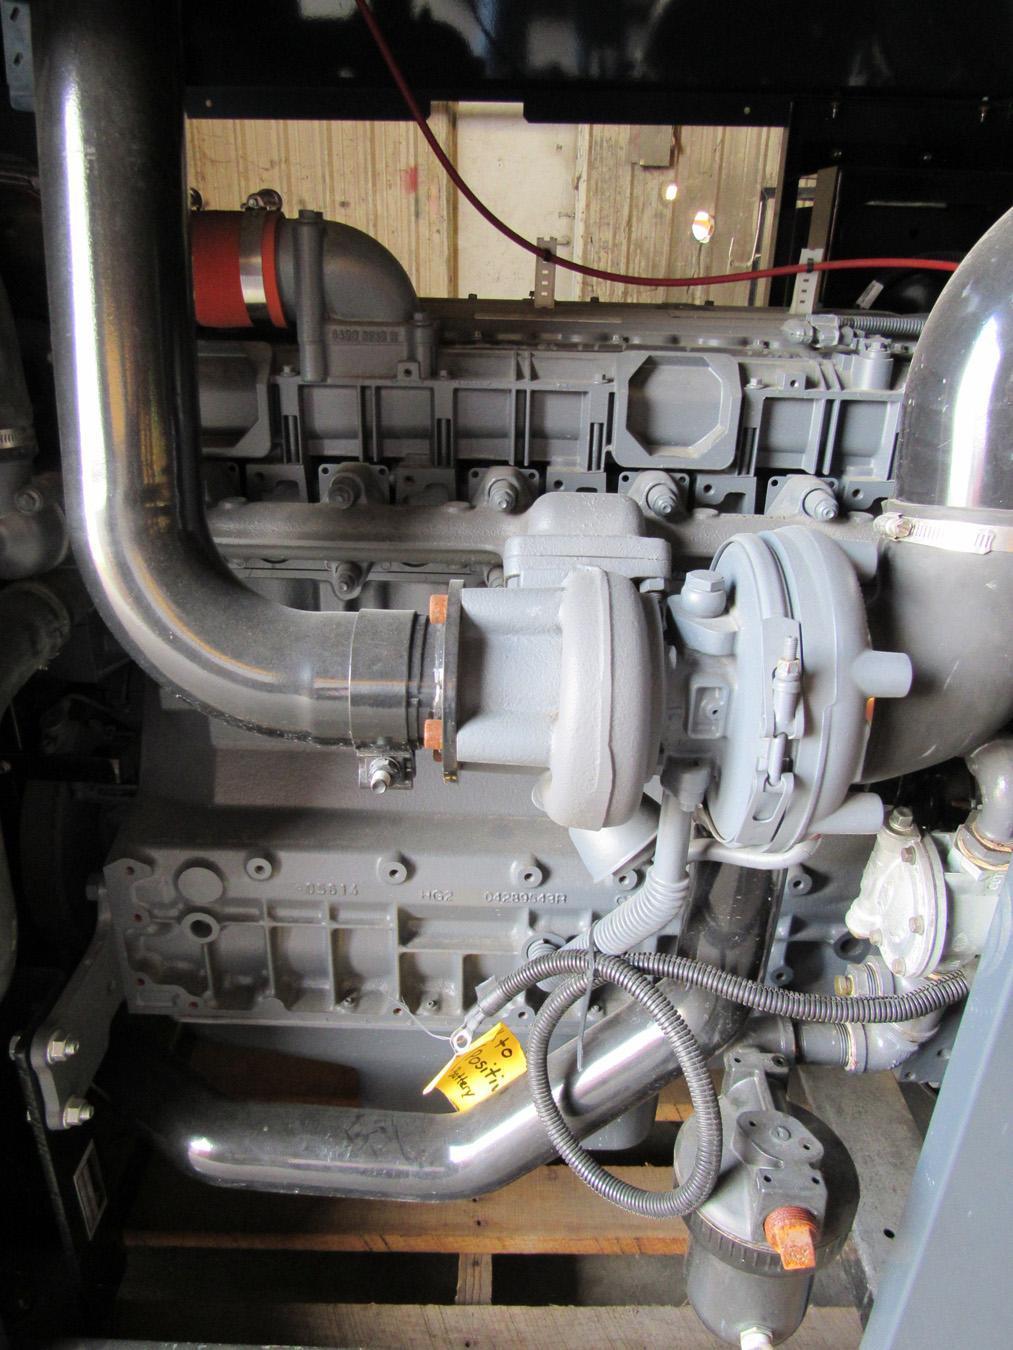 USED, 197 HP DEUTZ 2012 SERIES, MODEL TCD 2012 L06 2V, 6 CYLINDER DIESEL ENGINE POWER UNIT